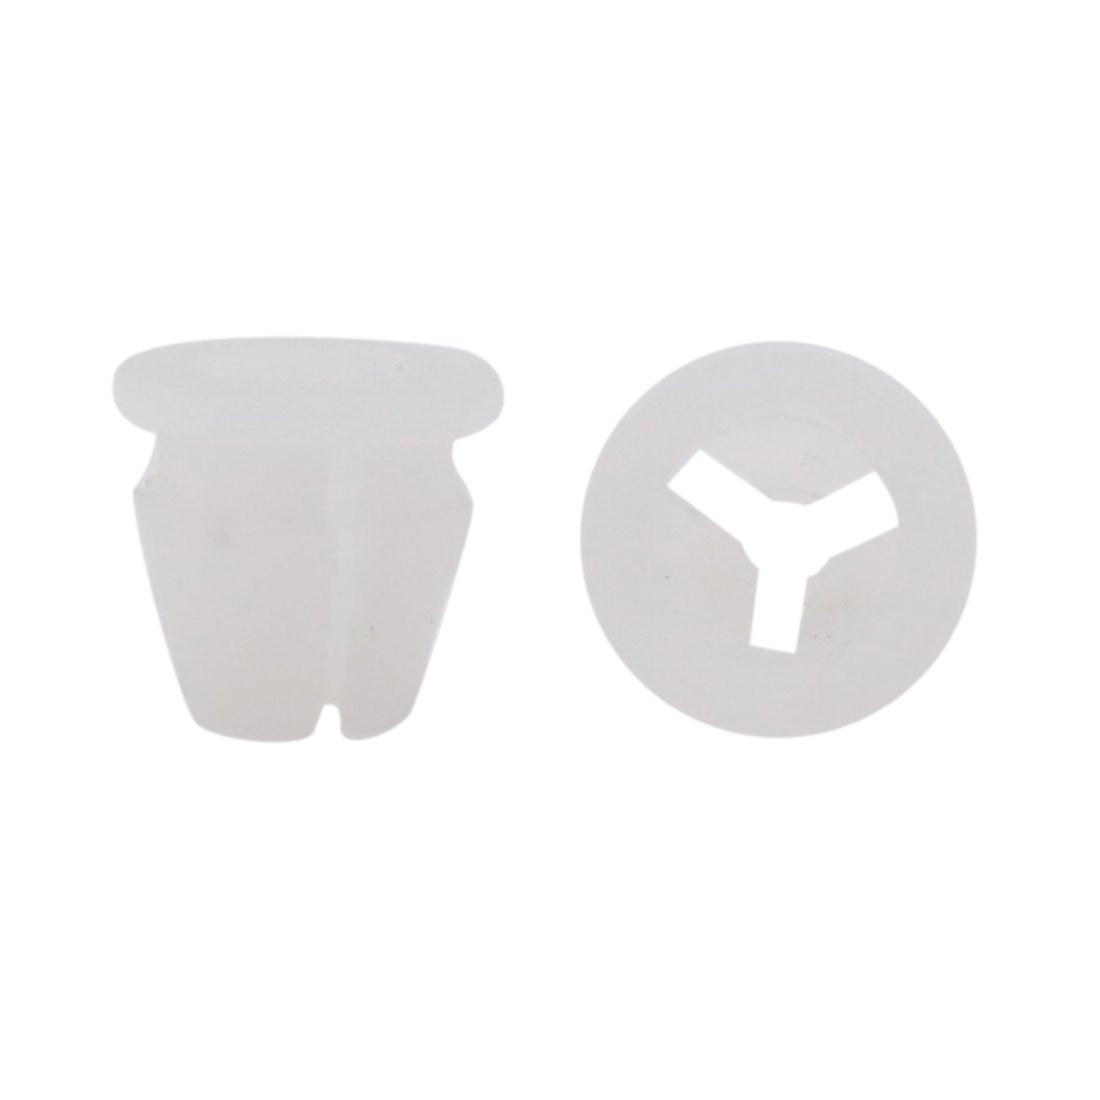 uxcell 100pcs 12mm Hole Plastic Rivets Trim Fastener Car Bumper Retainer Clips White